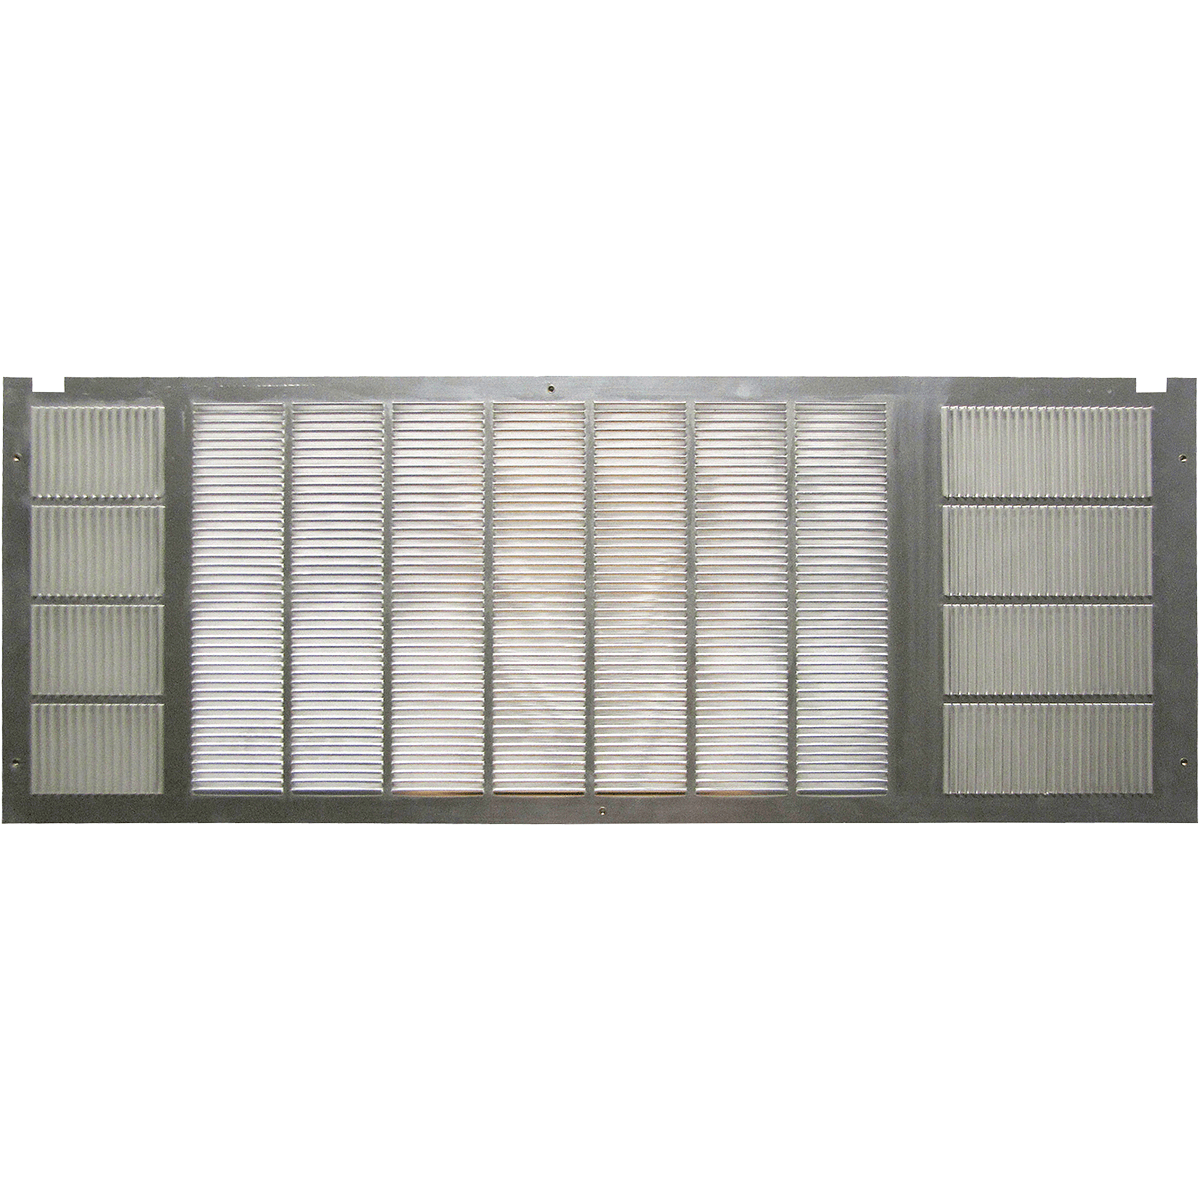 Comfort-aire Exterior Grill Stamped Aluminum 7602-501f